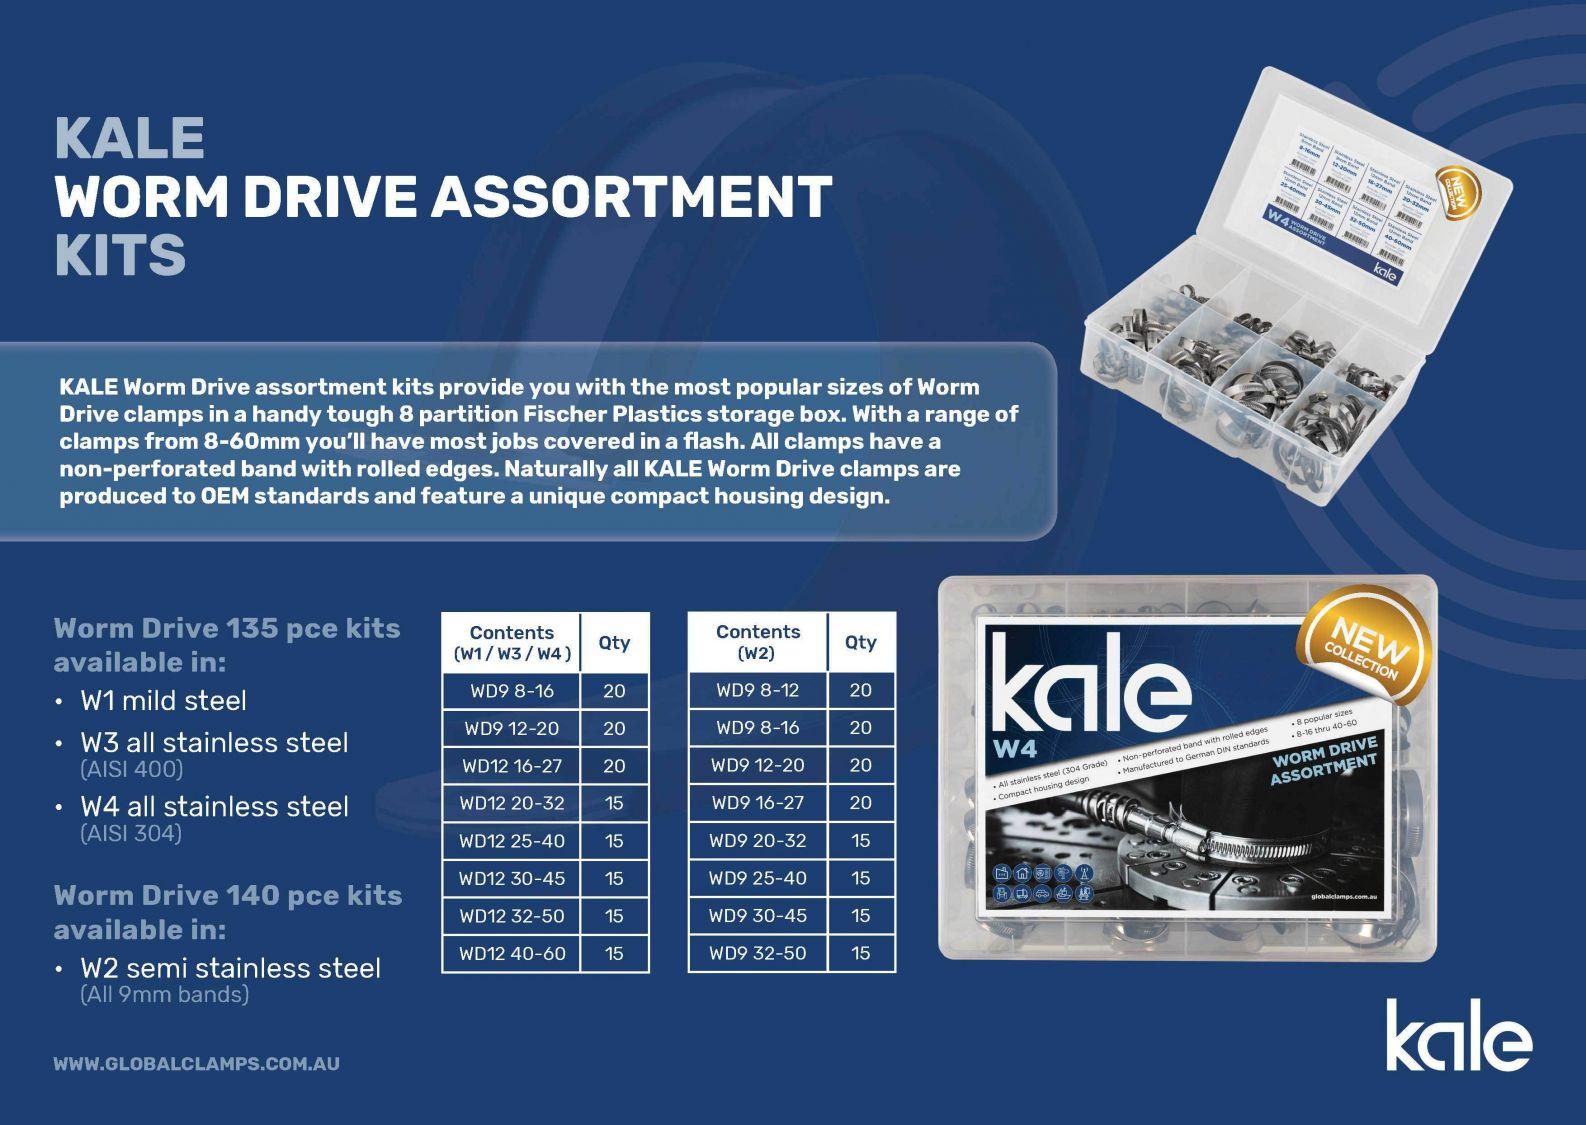 Kale Wd Assortment Flyer New